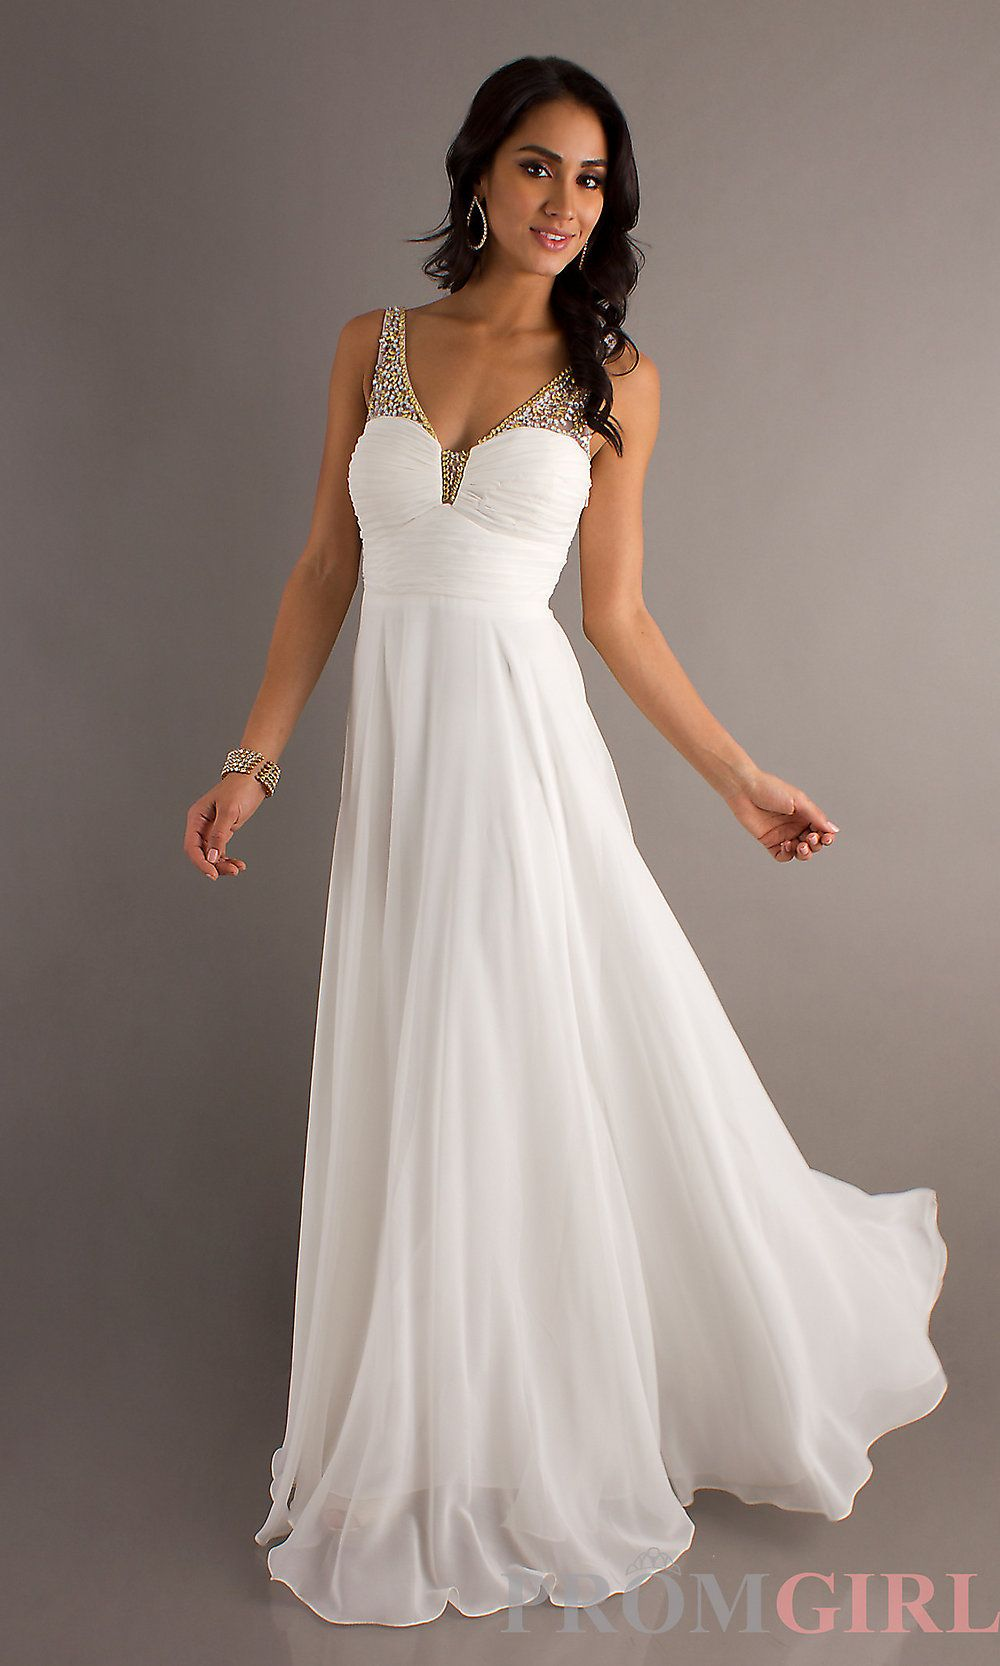 Long Ivory Dress